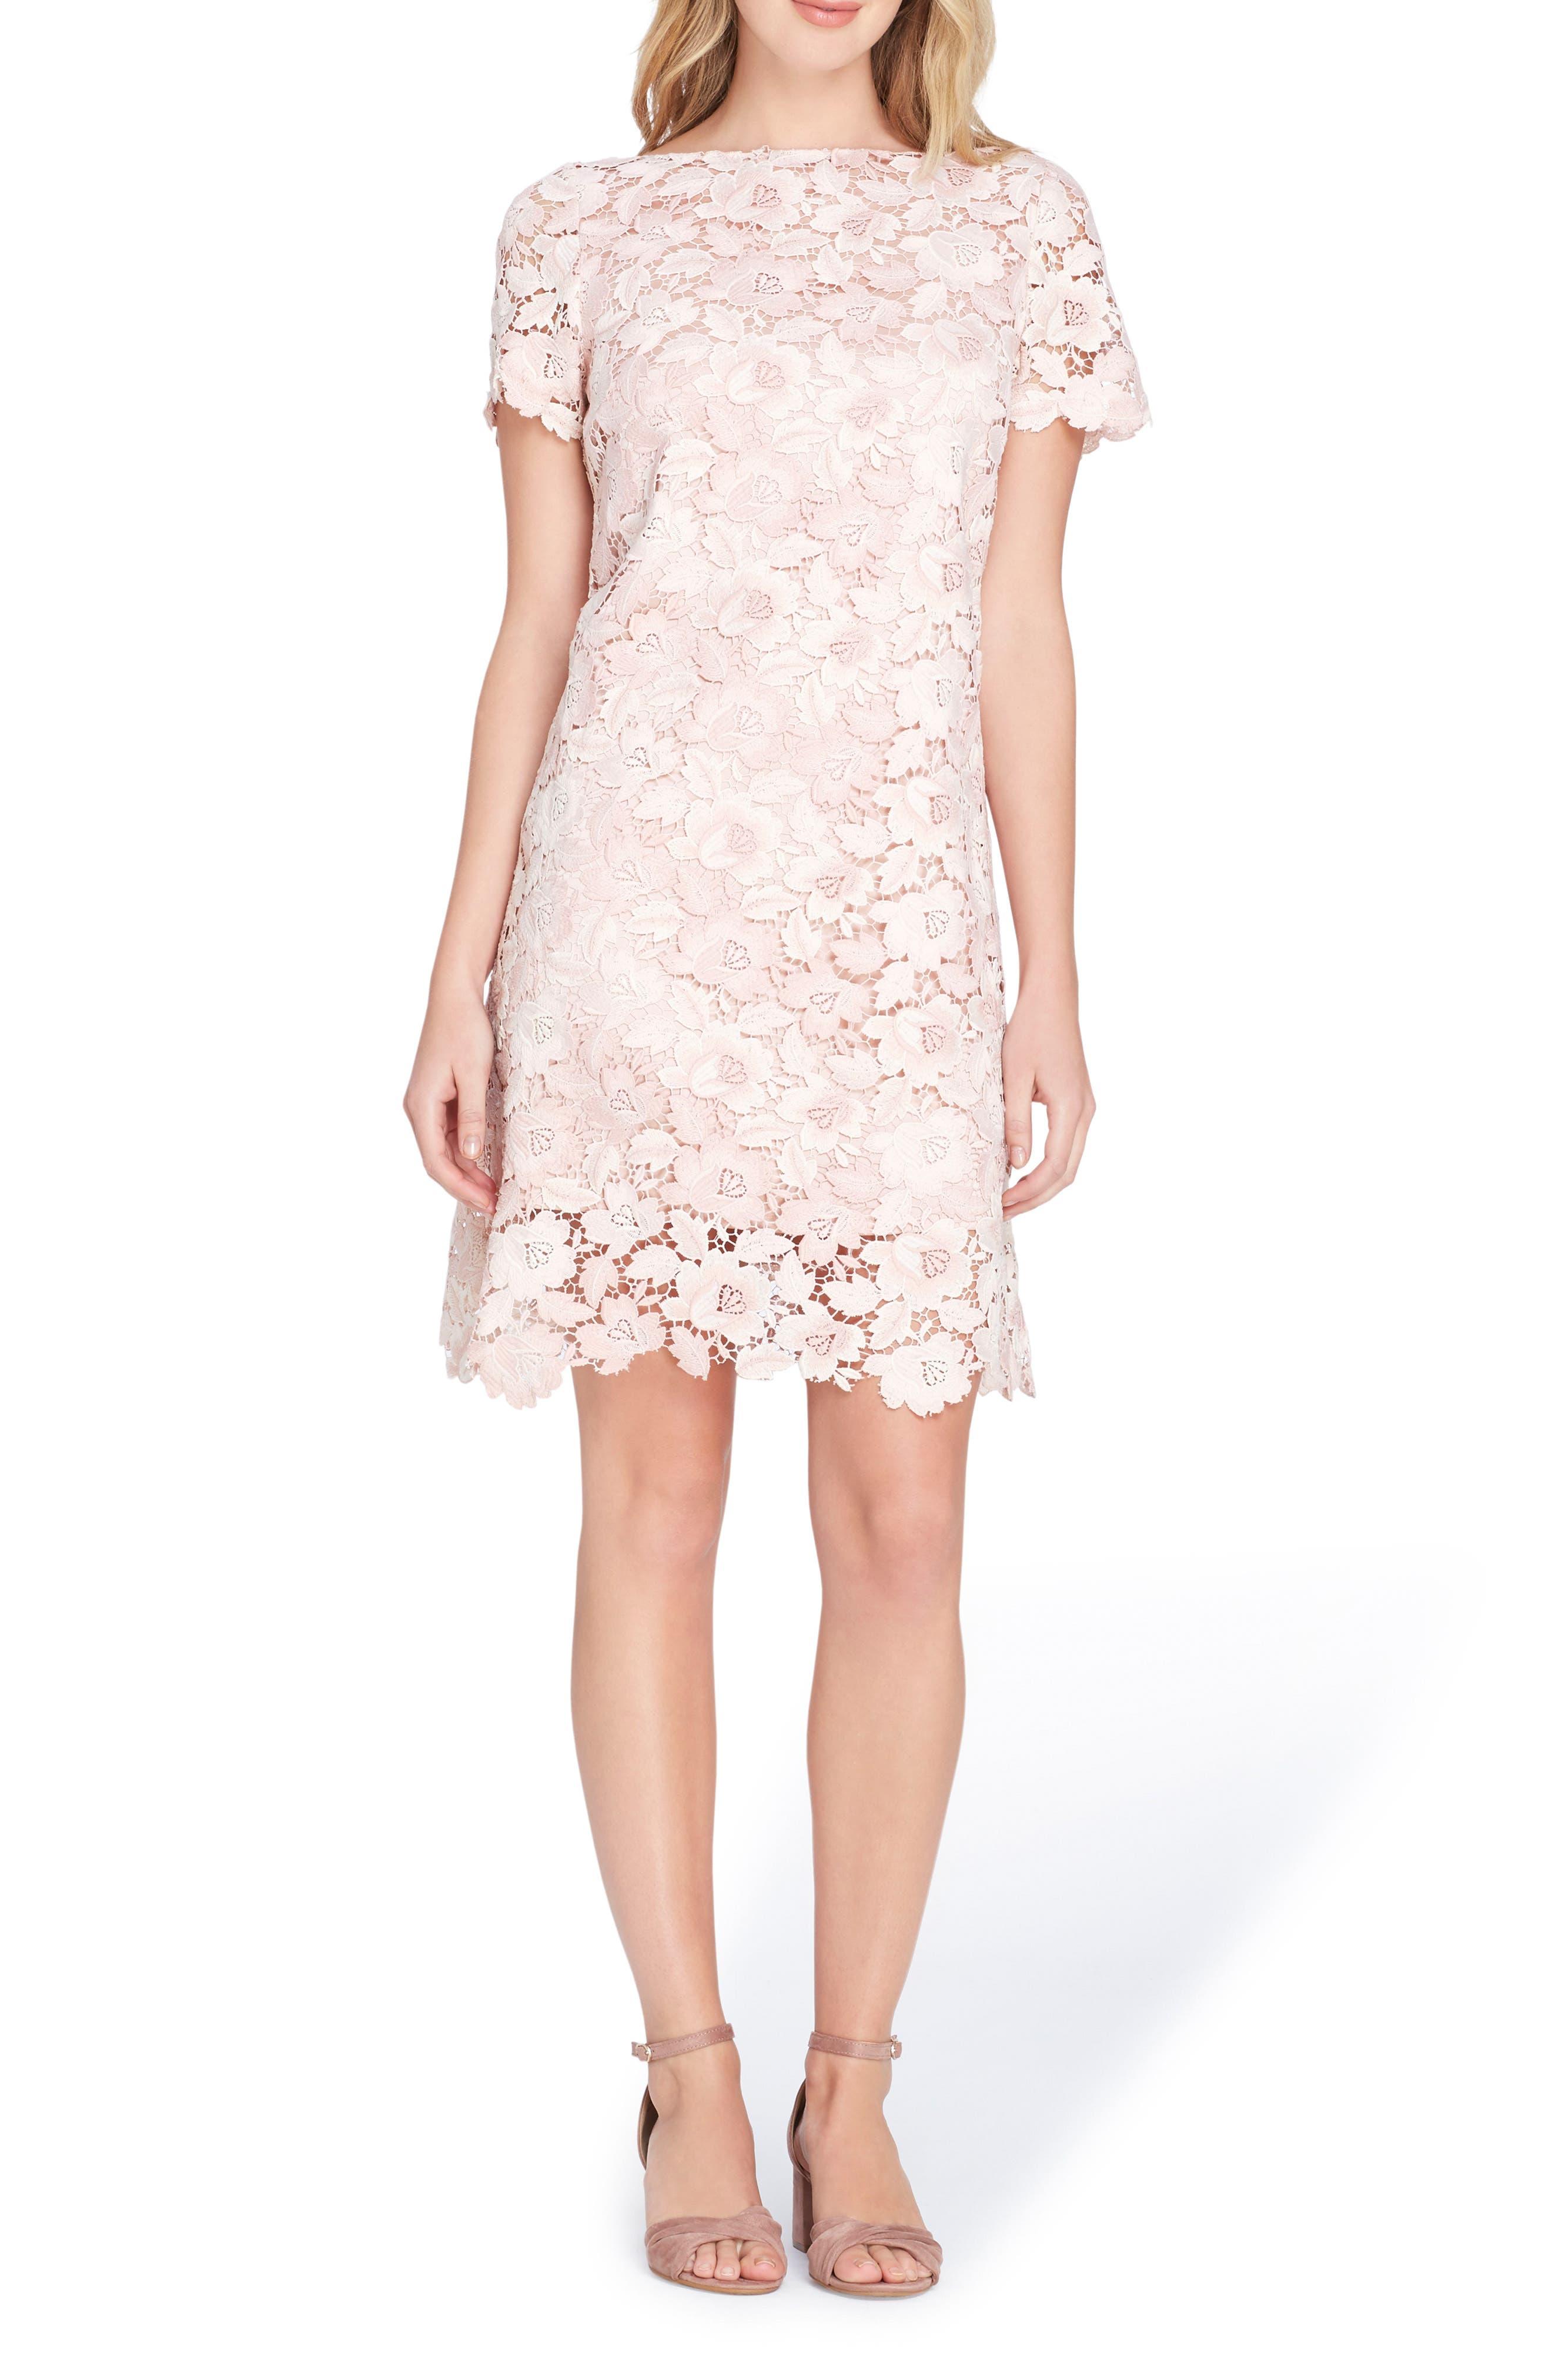 Lace Sheath Dress,                         Main,                         color, Ivory/ Blush